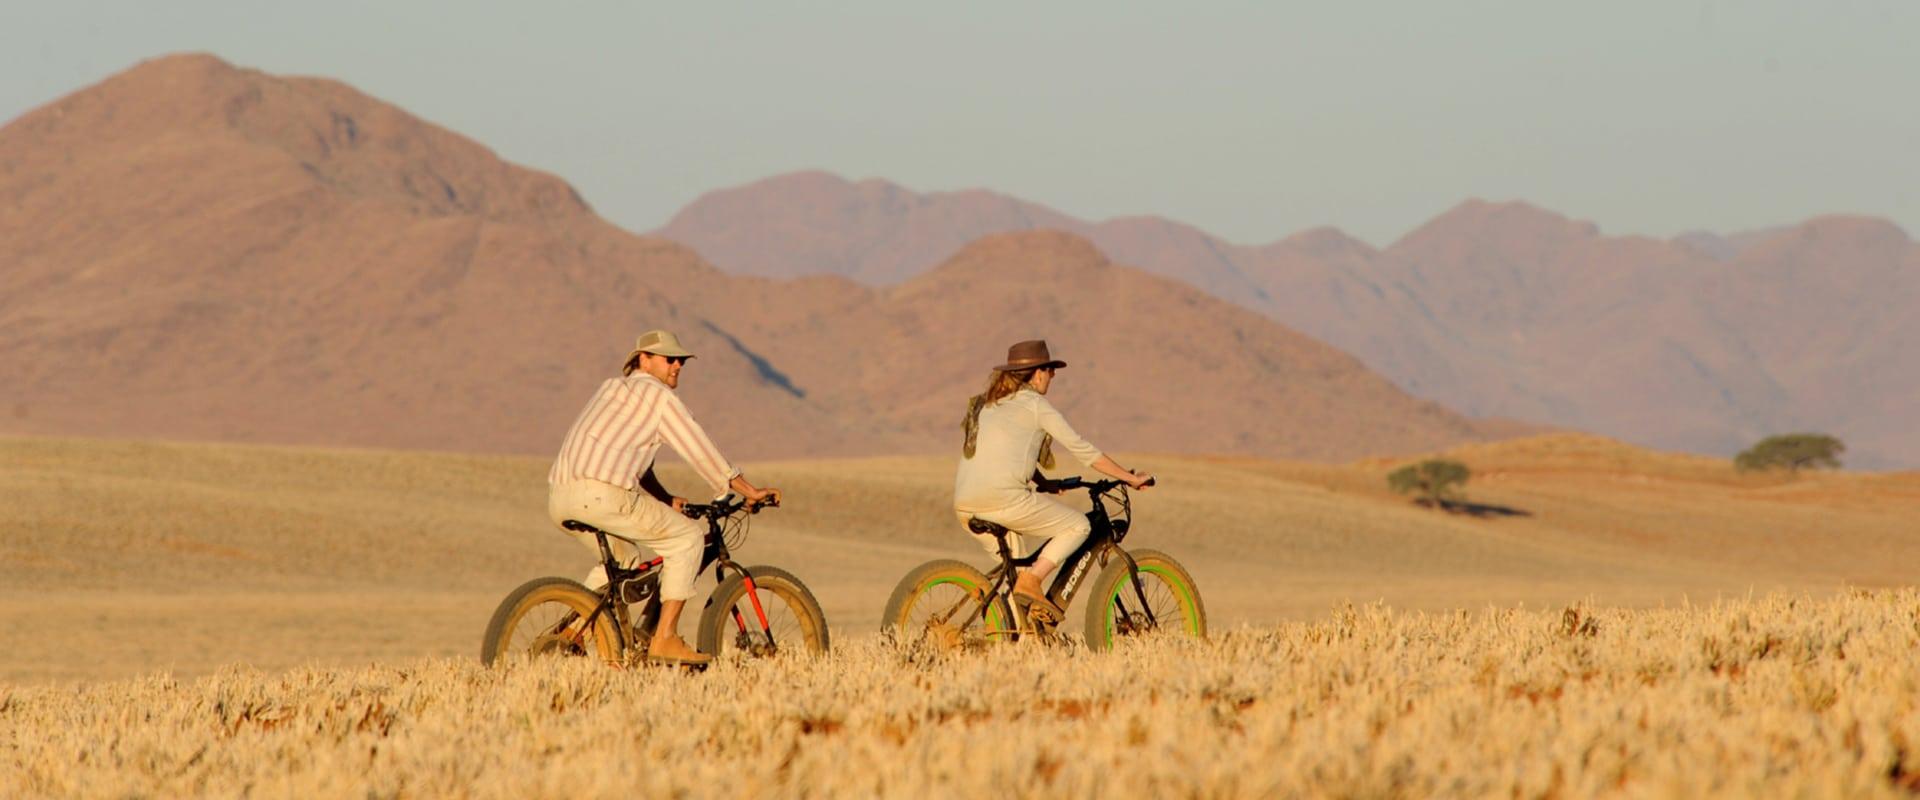 Cruise with an e-Bike